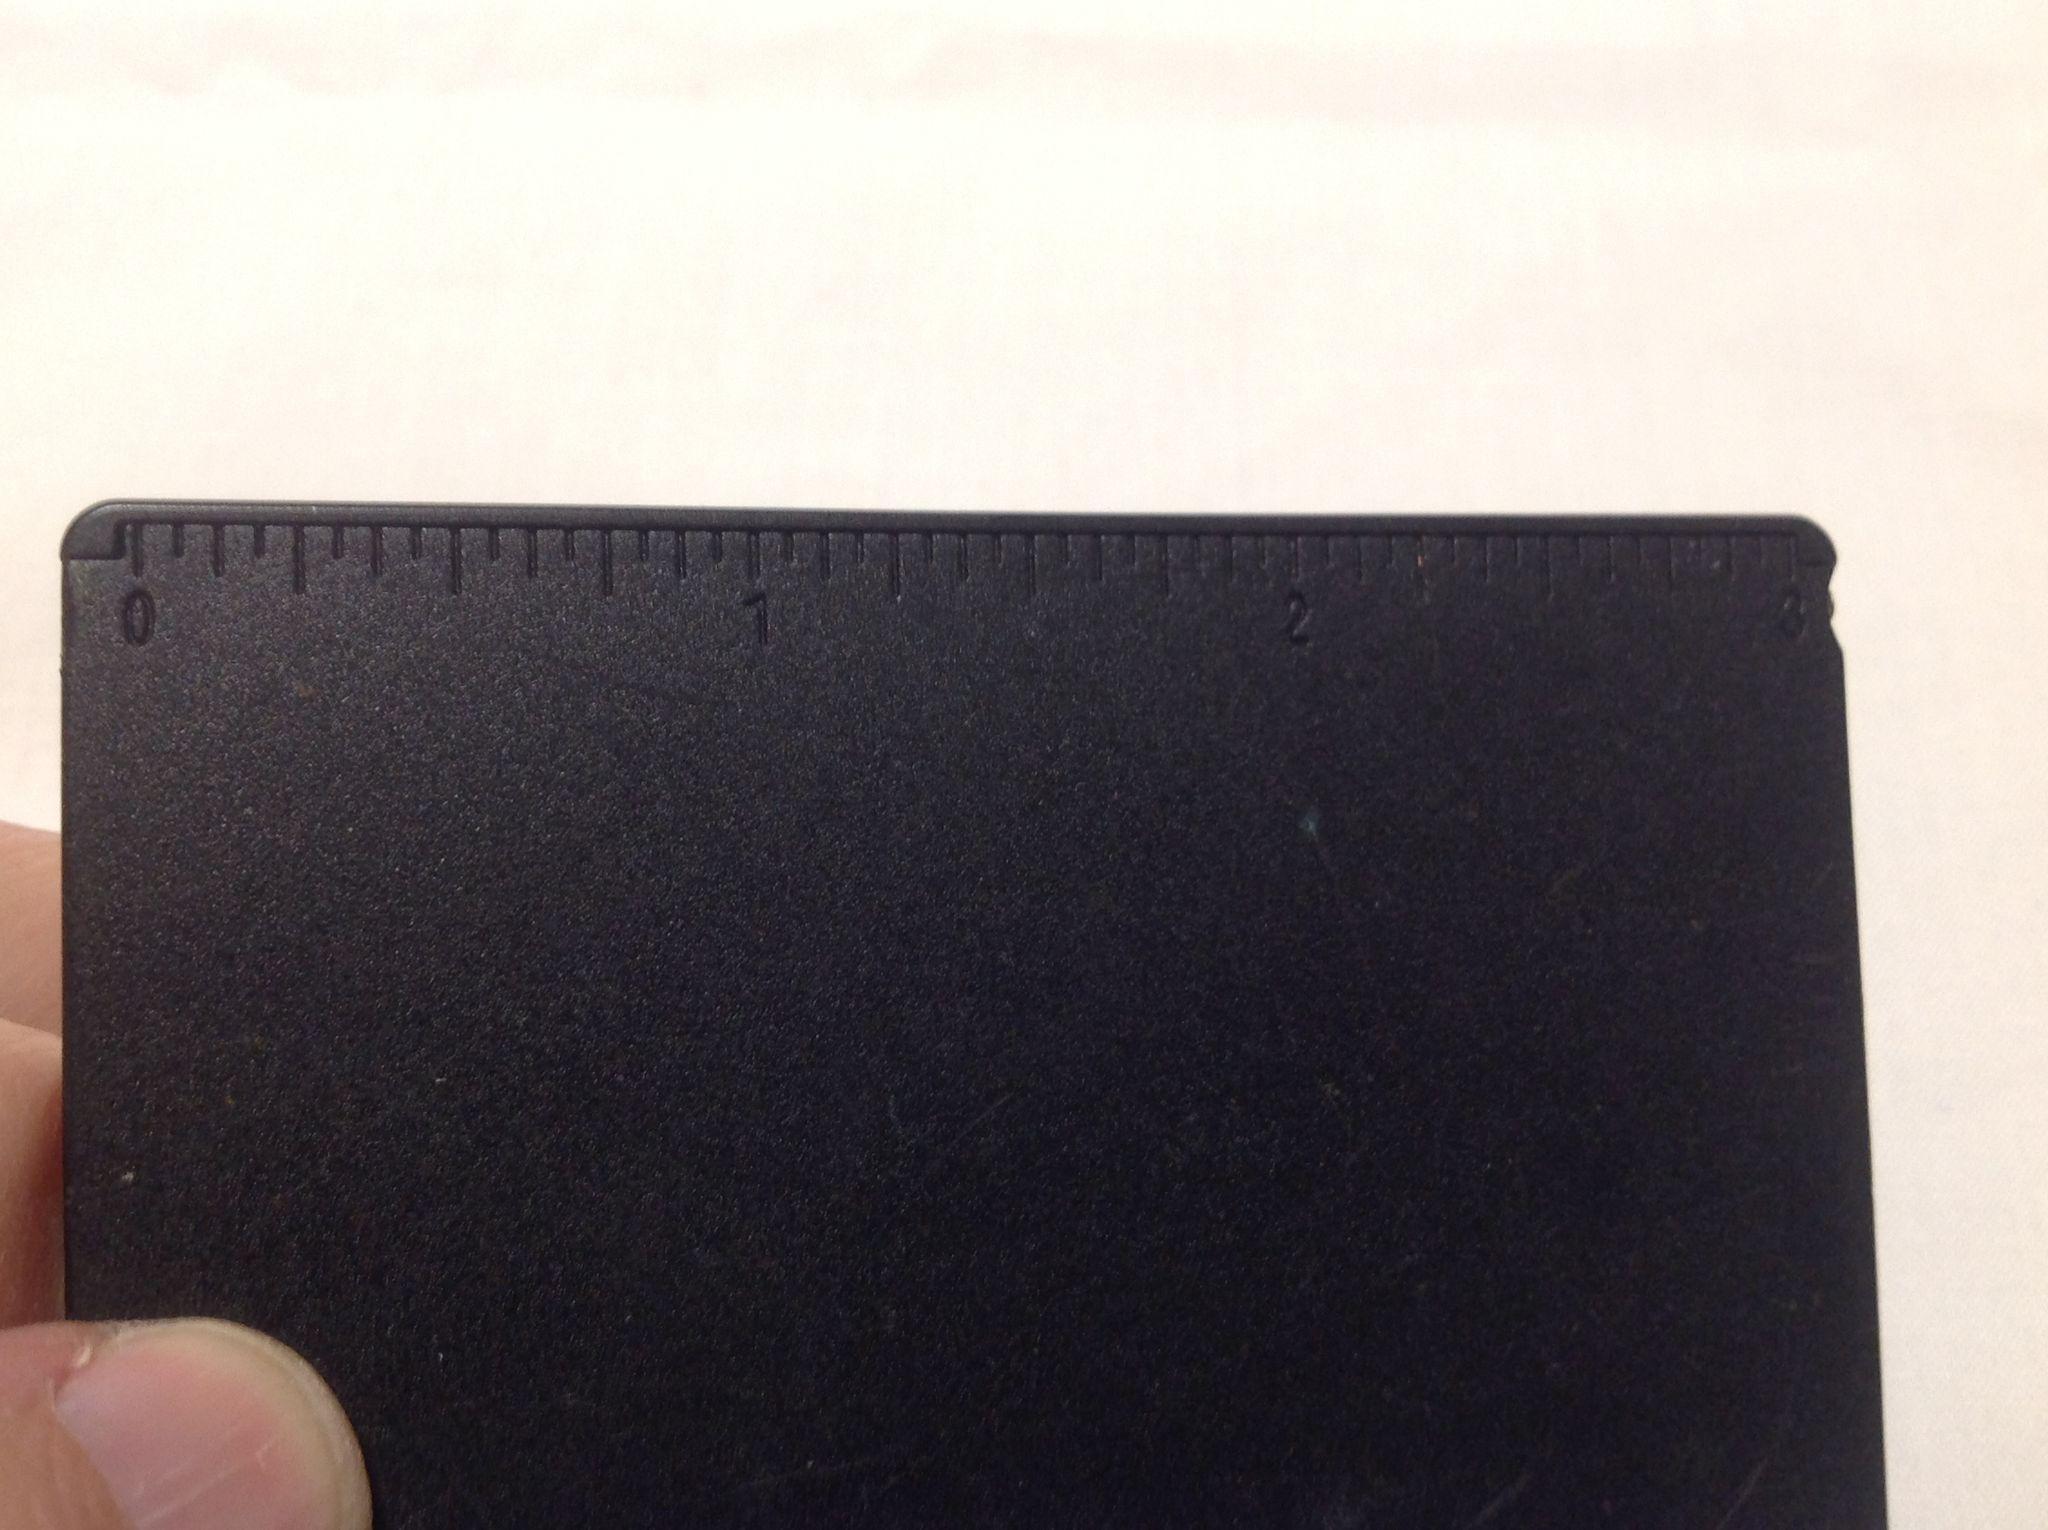 Victorinox Swiss Army Swiss Card Credit Card Multitool